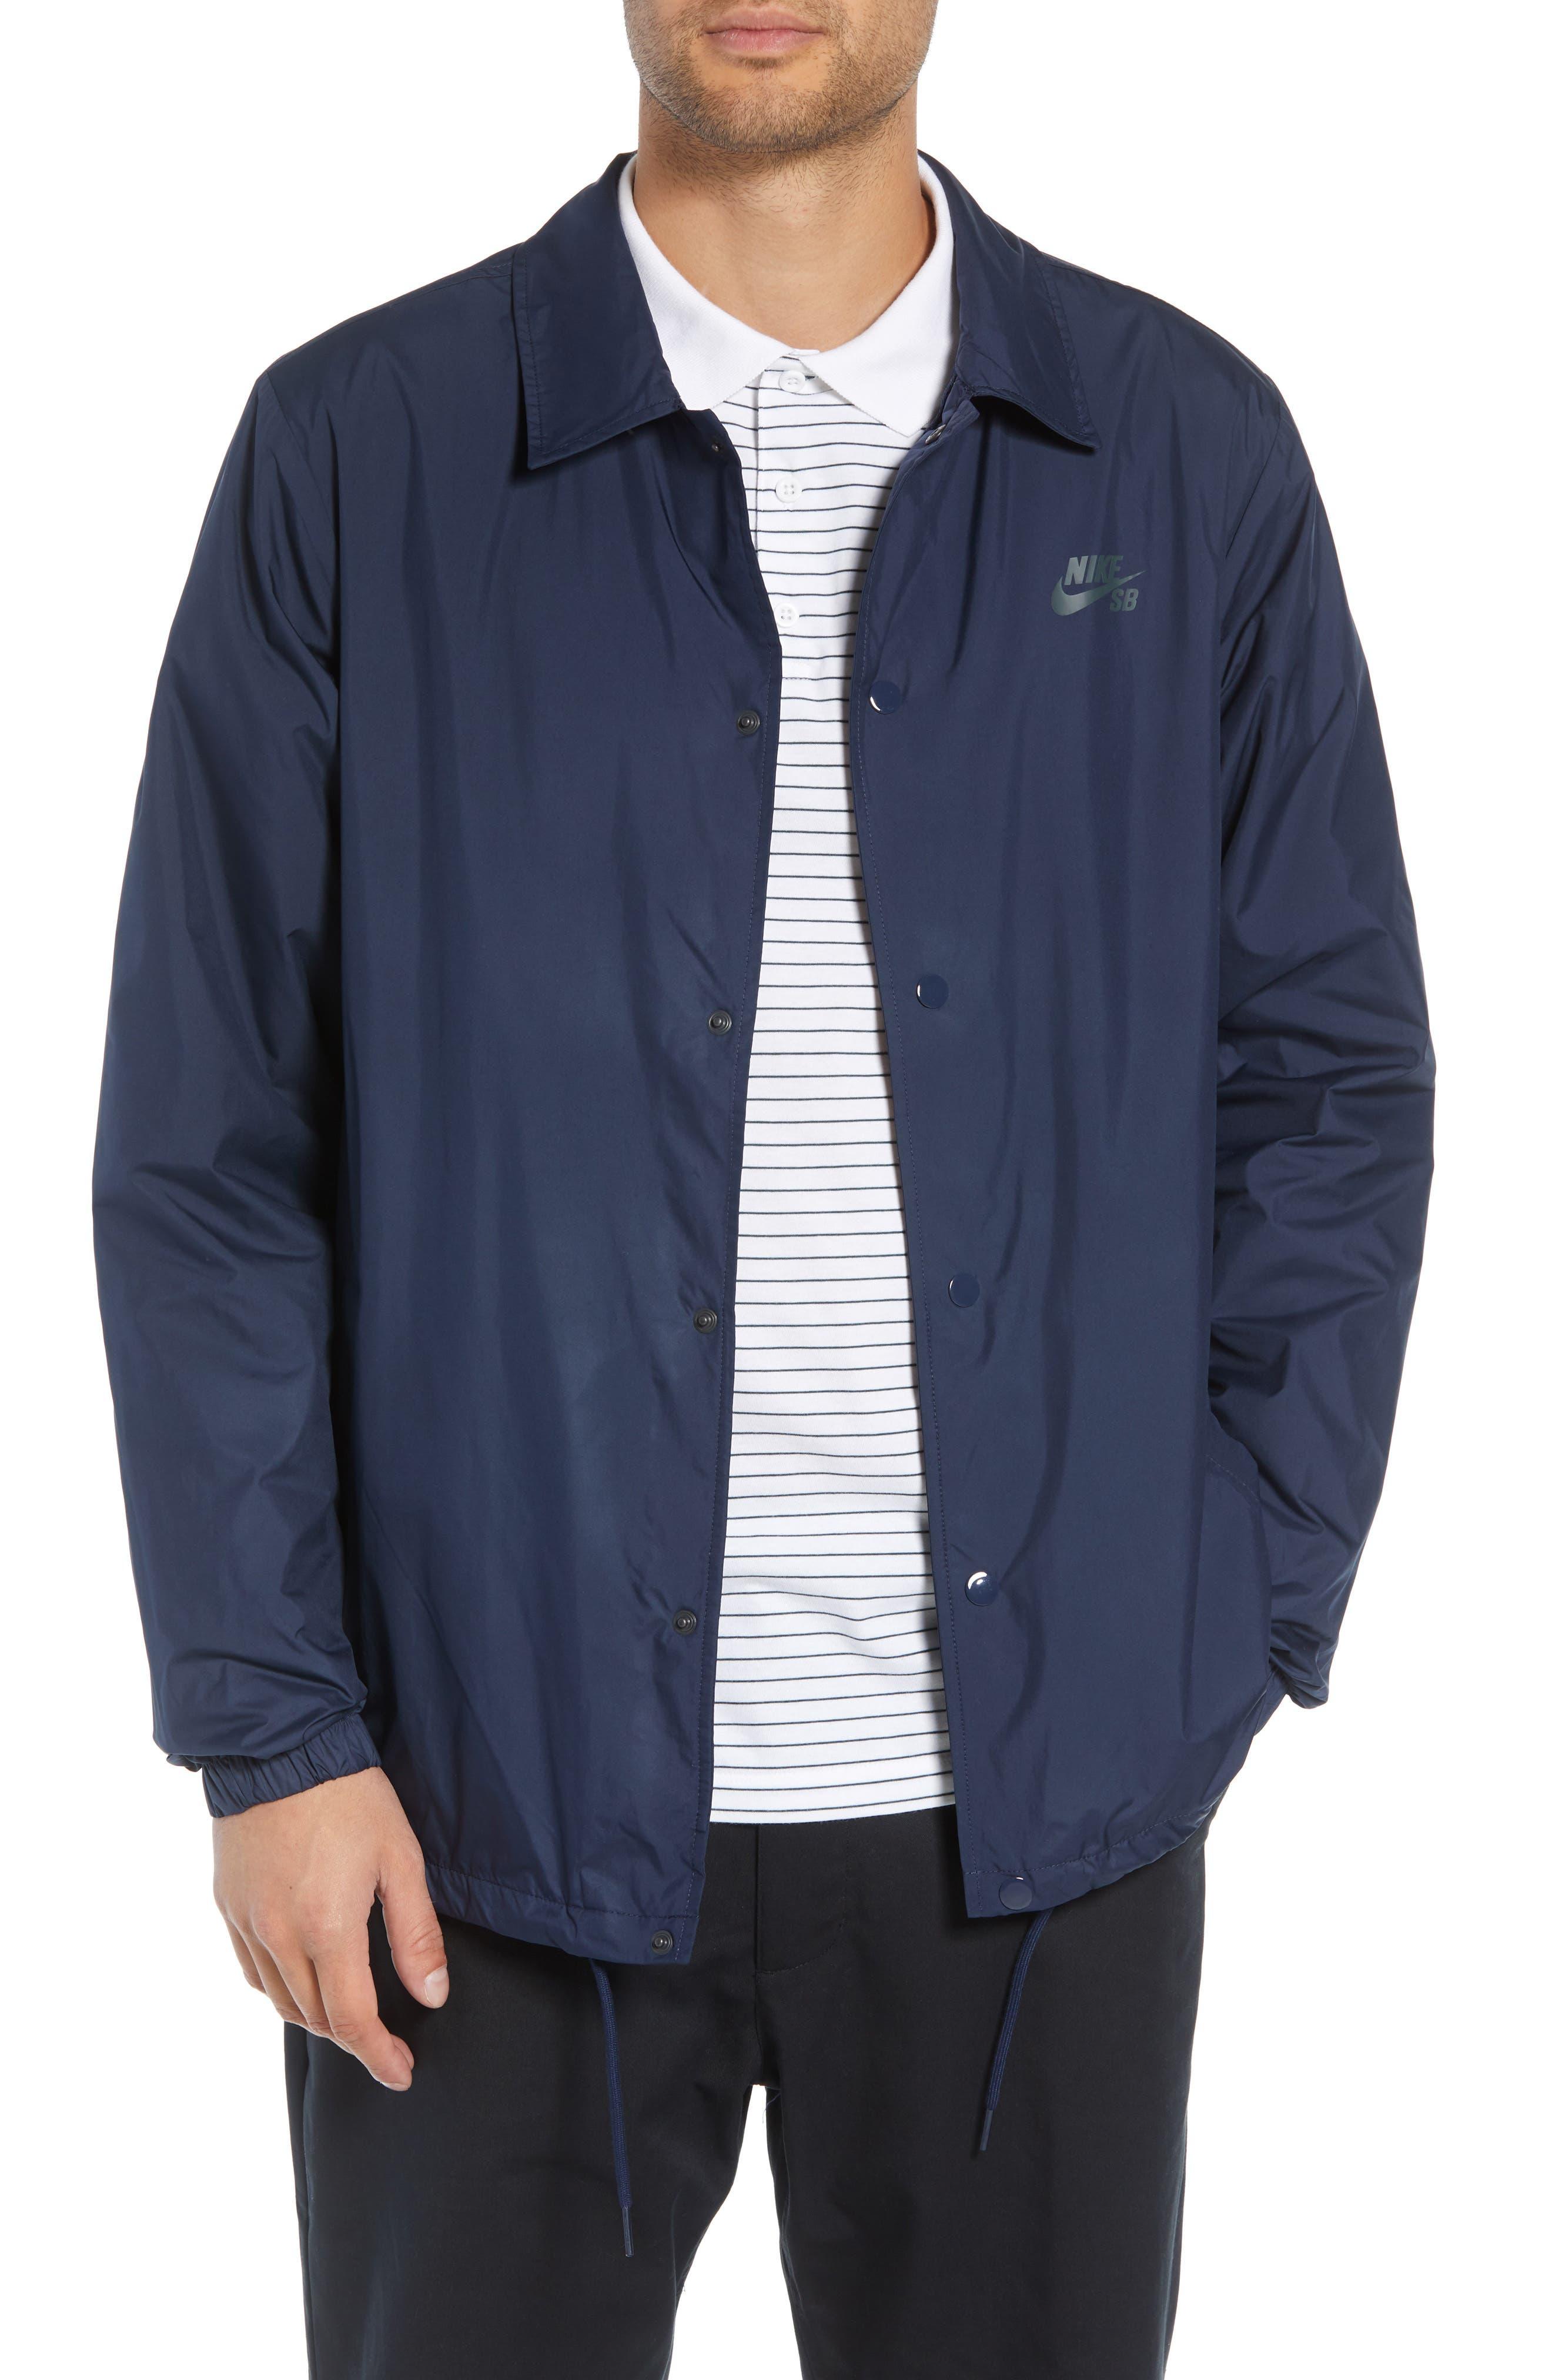 SB Shield Coach's Jacket,                             Main thumbnail 1, color,                             OBSIDIAN/ ANTHRACITE